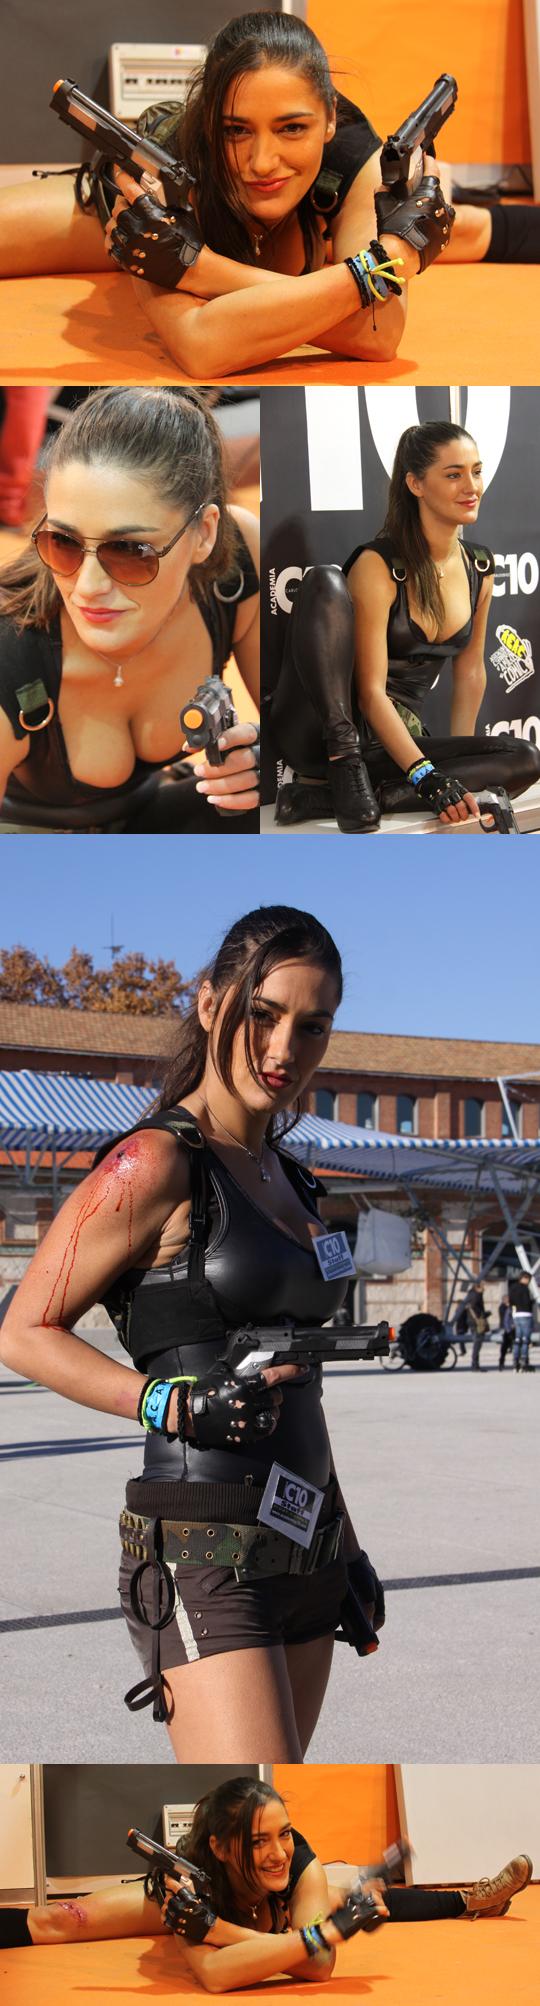 Lara Croft posa para Carlos Díez. Fantasia pin up. Diseño de moda. Fotografia.